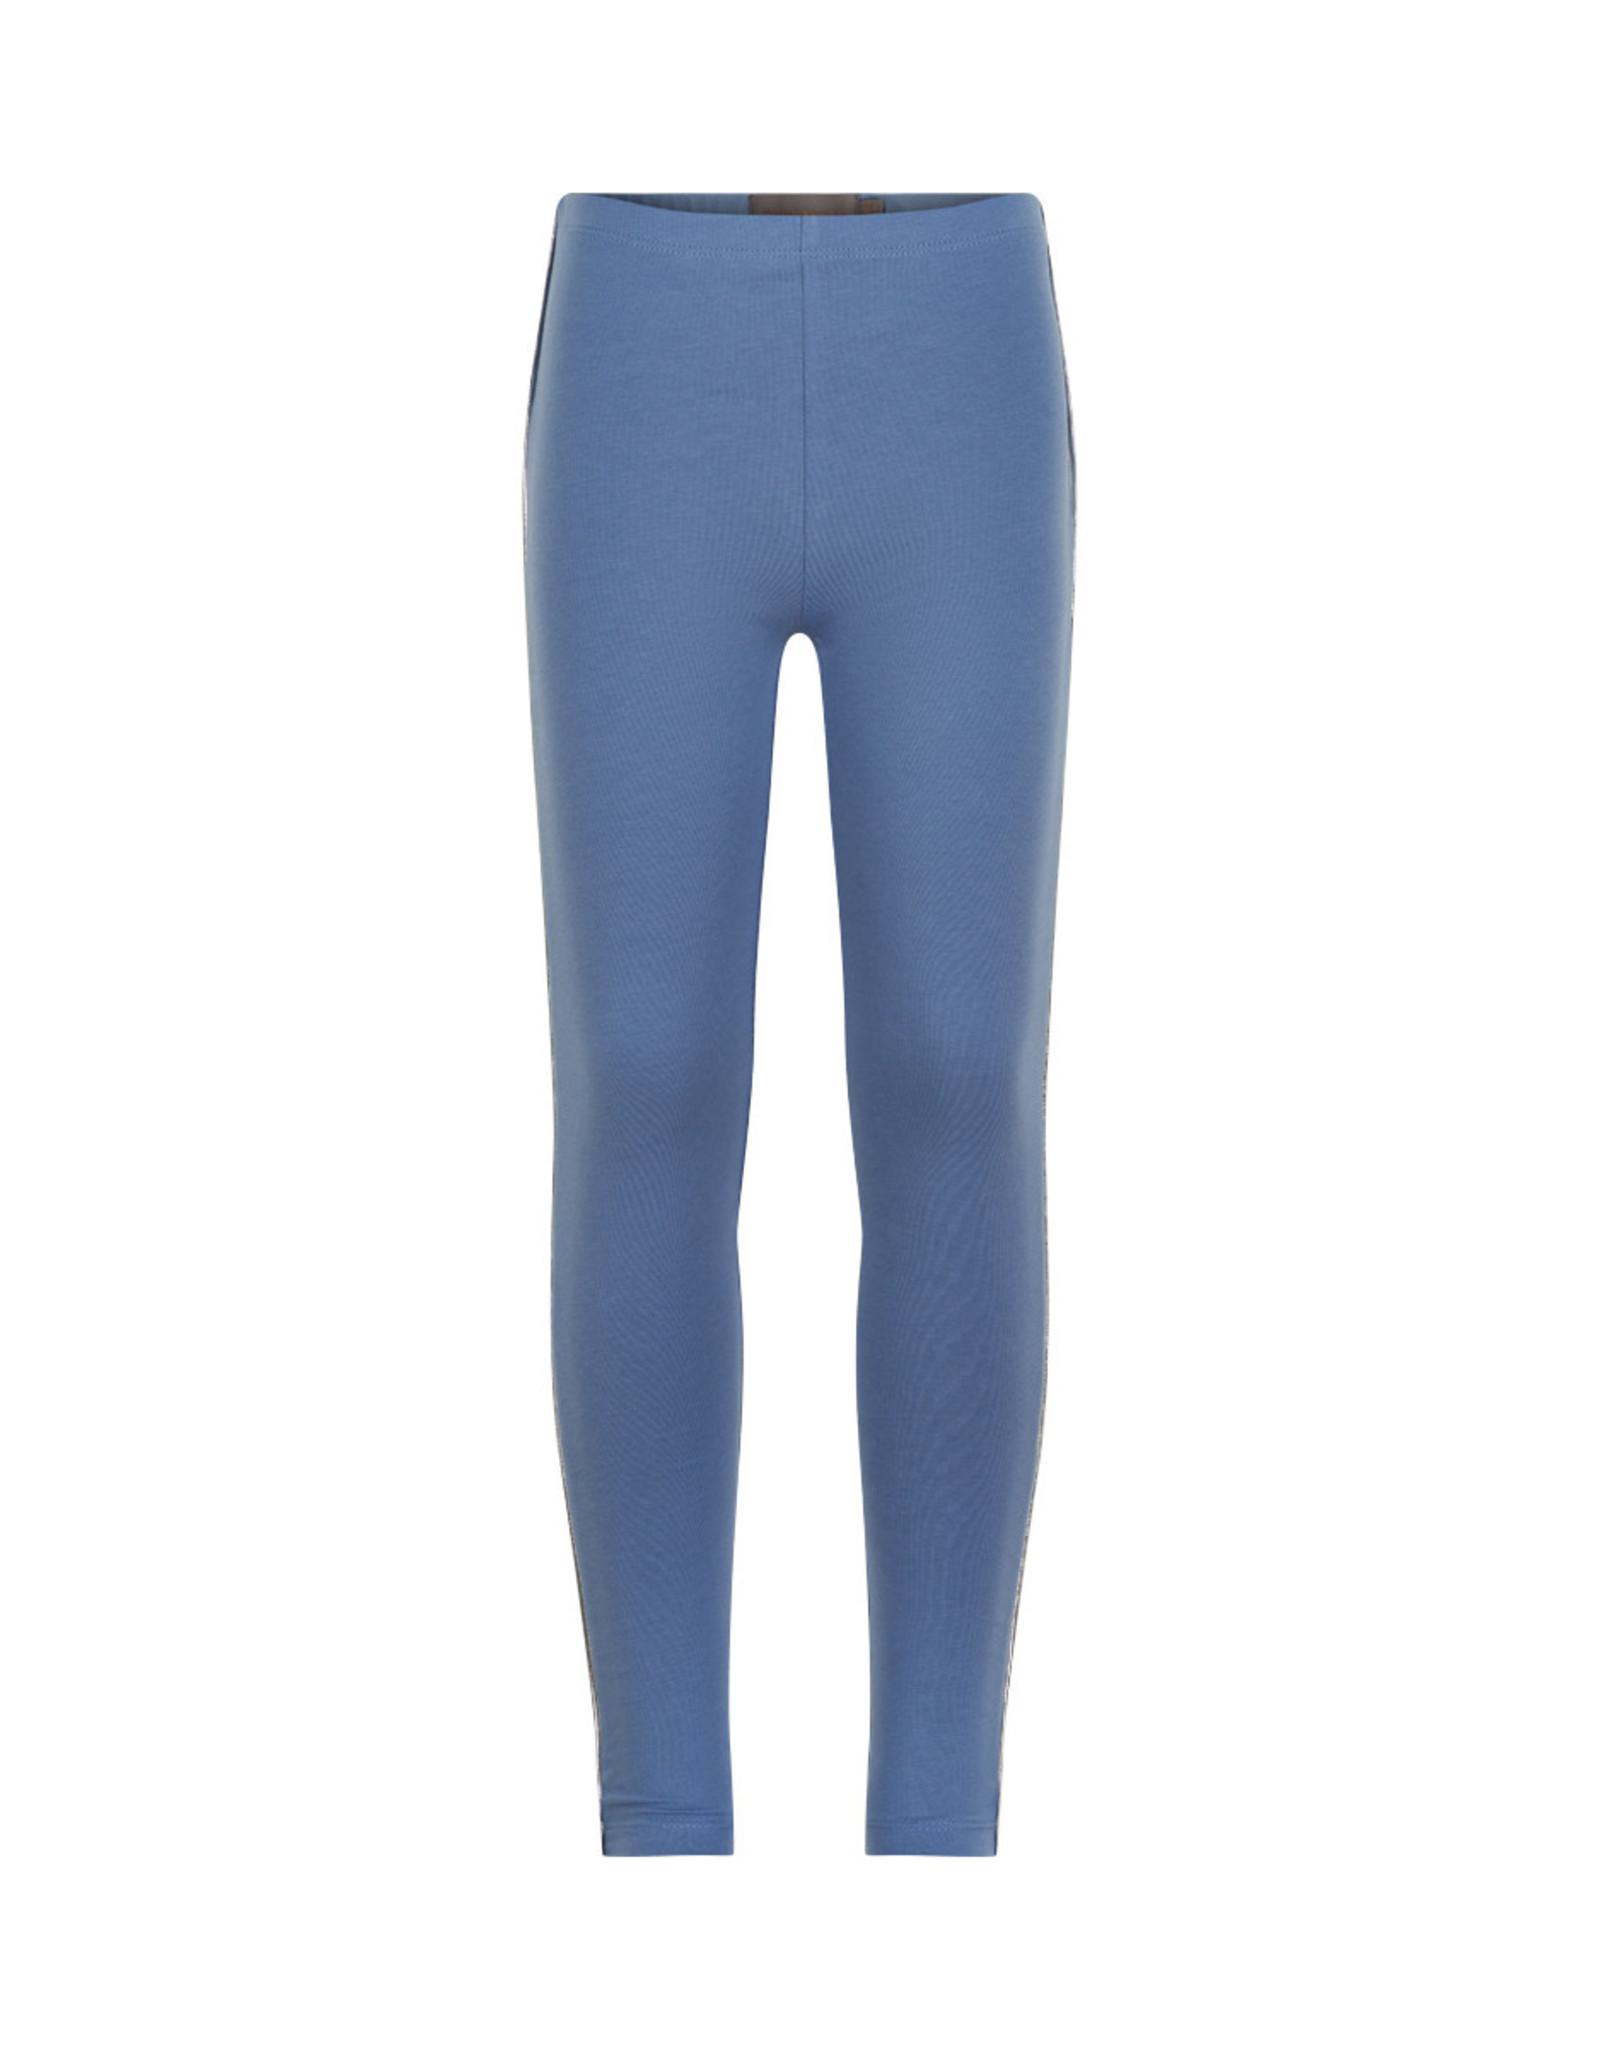 Creamie SP21 G Blue Leggings